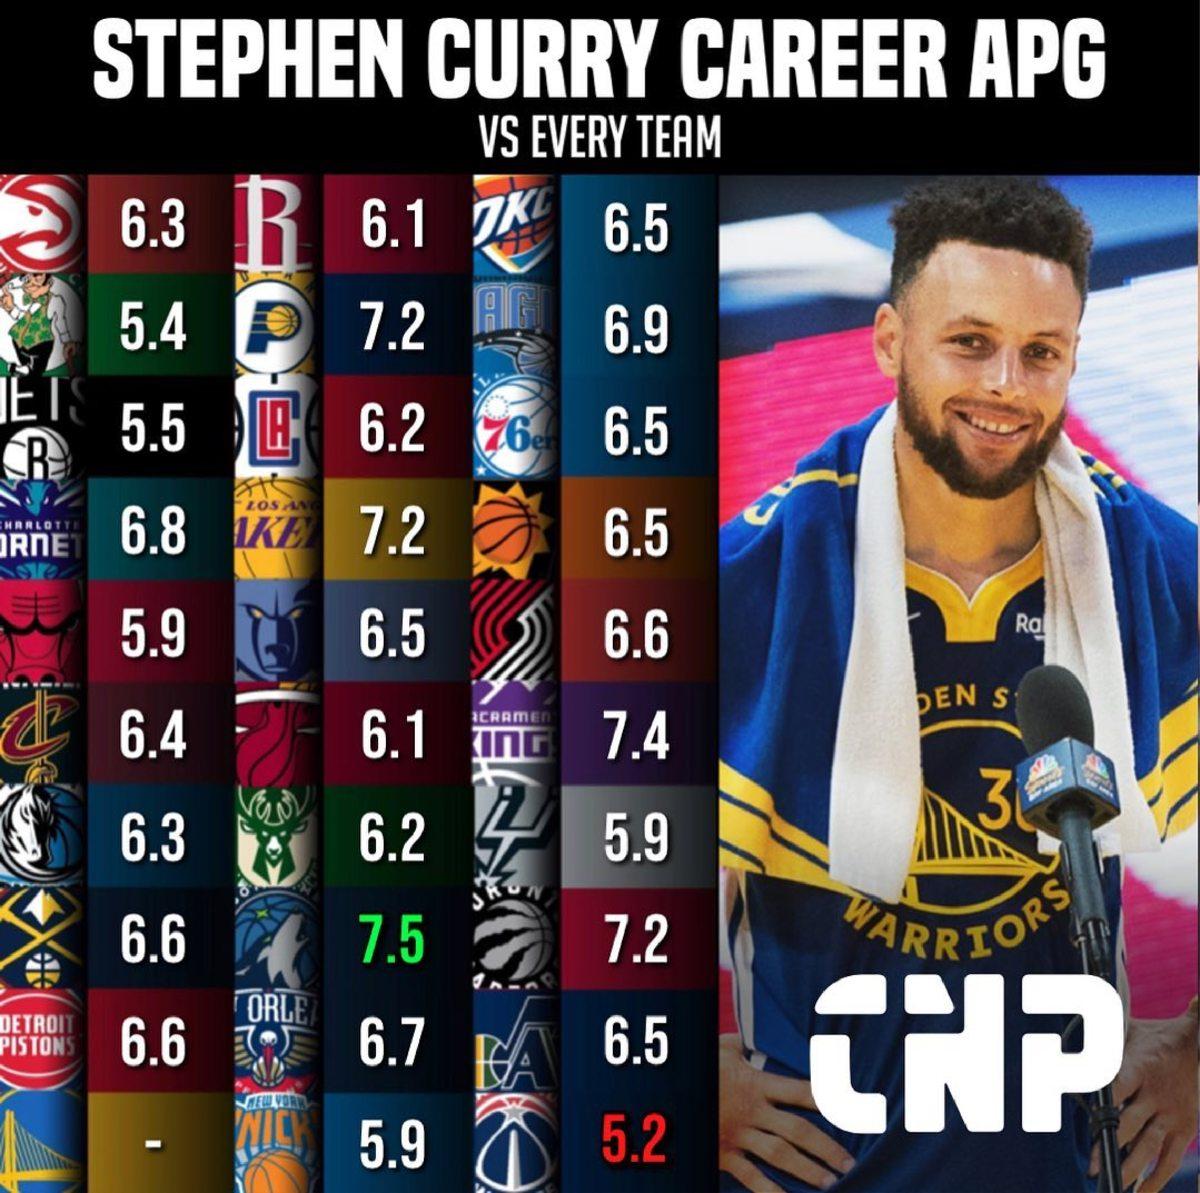 Stephen Curry Career APG